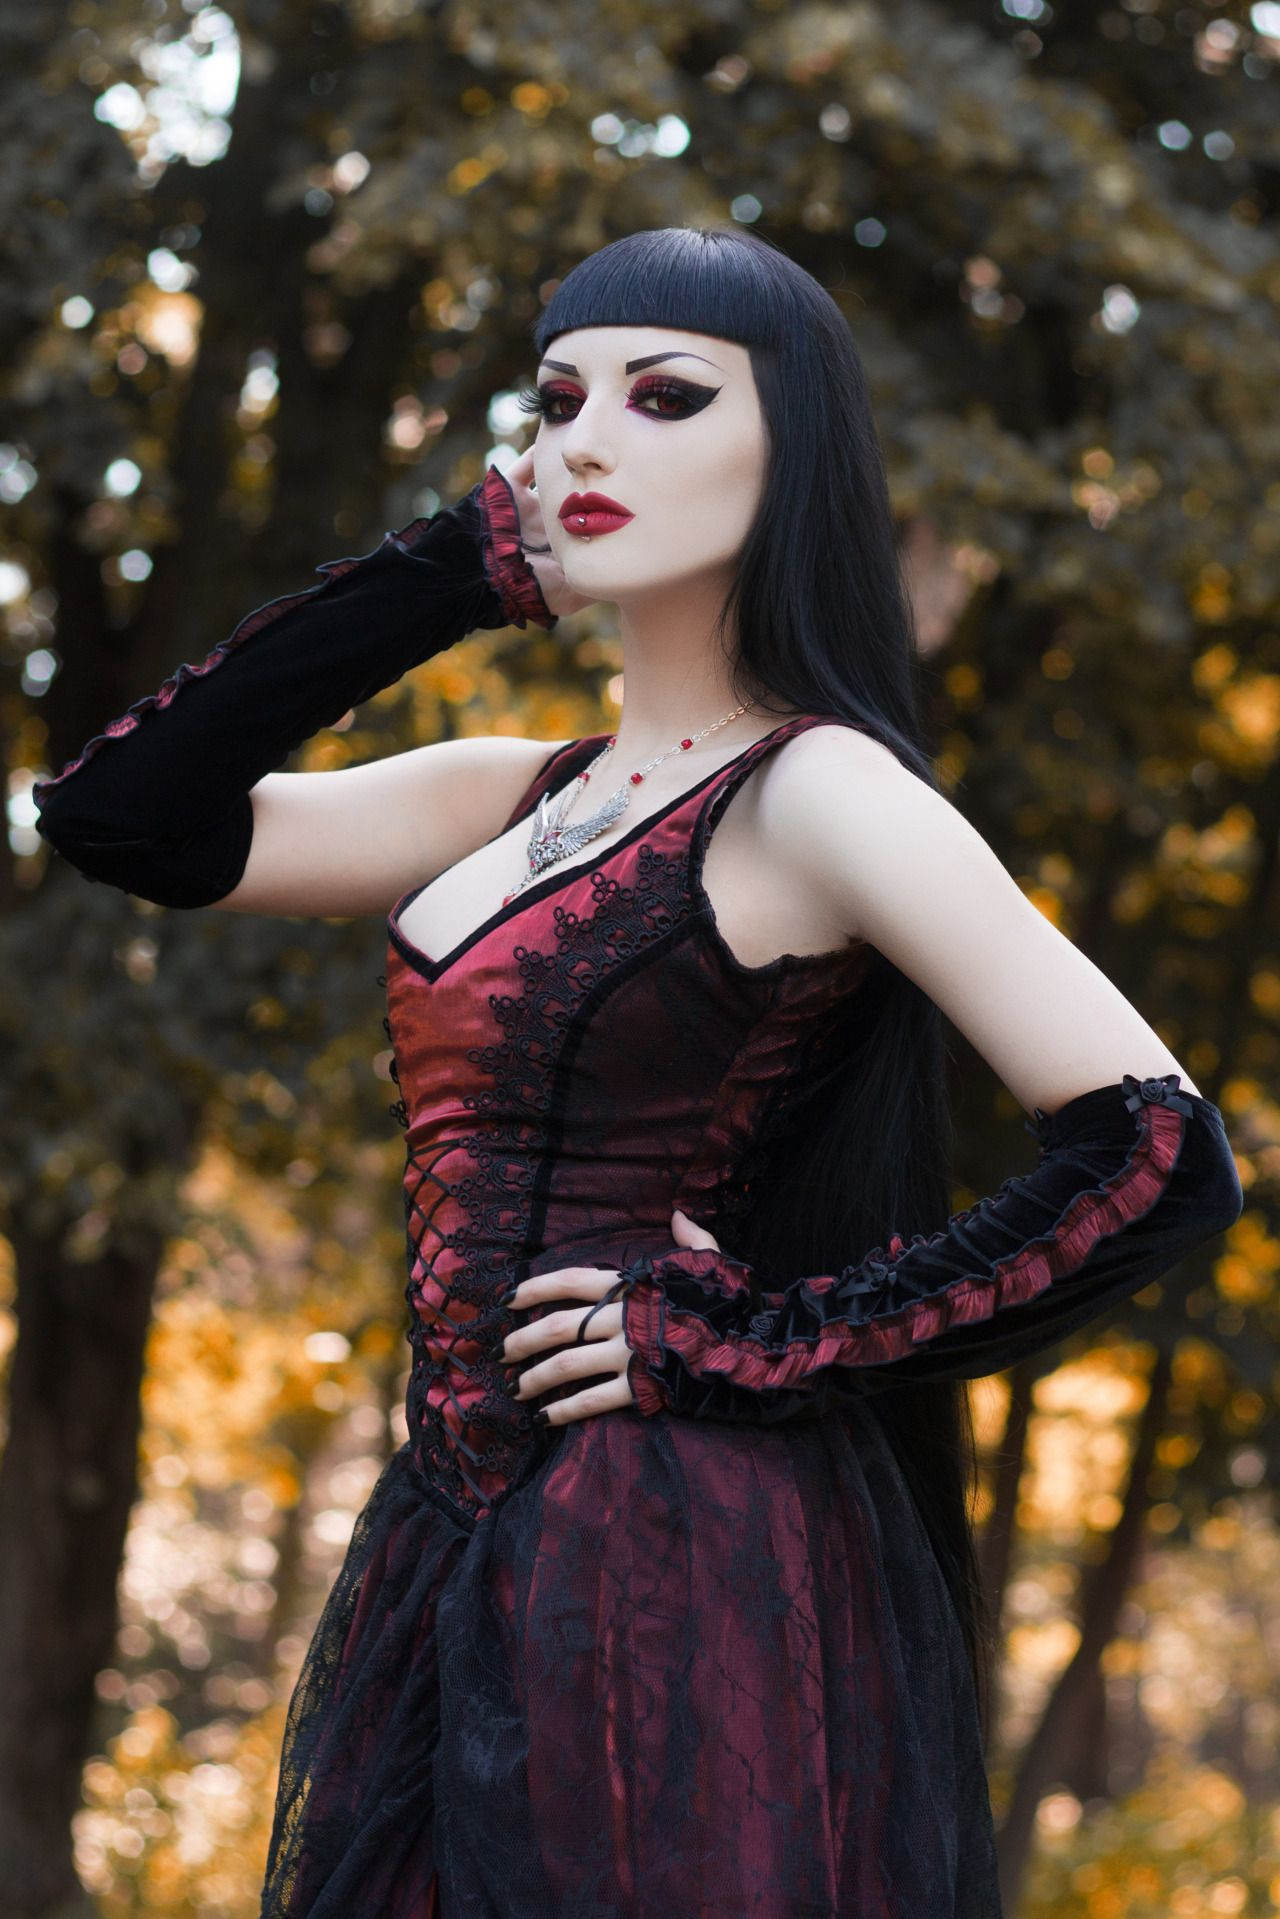 Pin Ettesore Vtm Oc Serena Goth Gothic